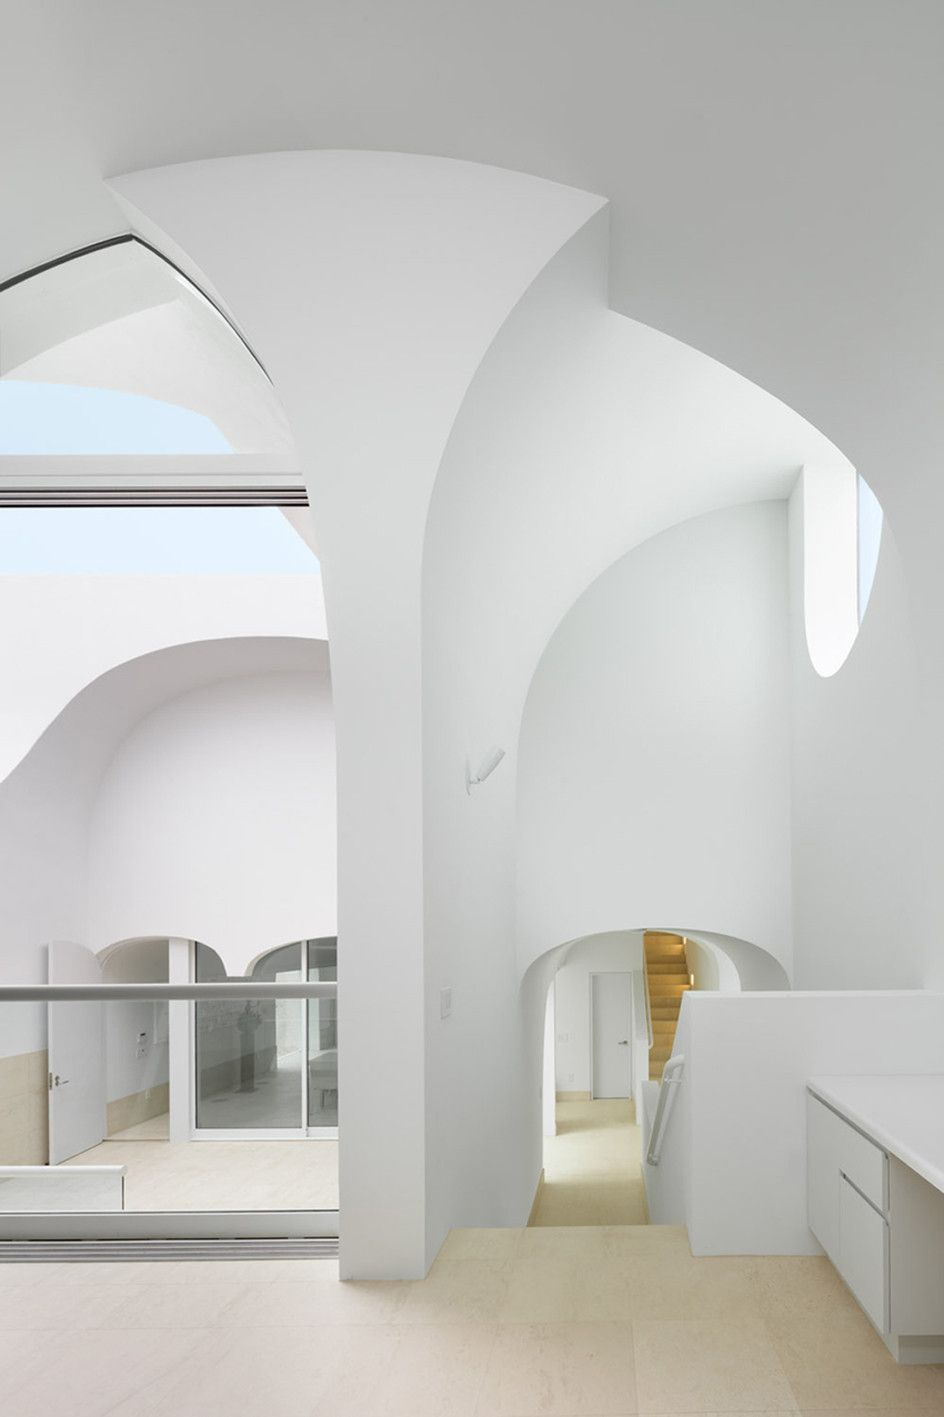 Super Gallery Of Vault House Johnston Marklee 13 Download Free Architecture Designs Scobabritishbridgeorg